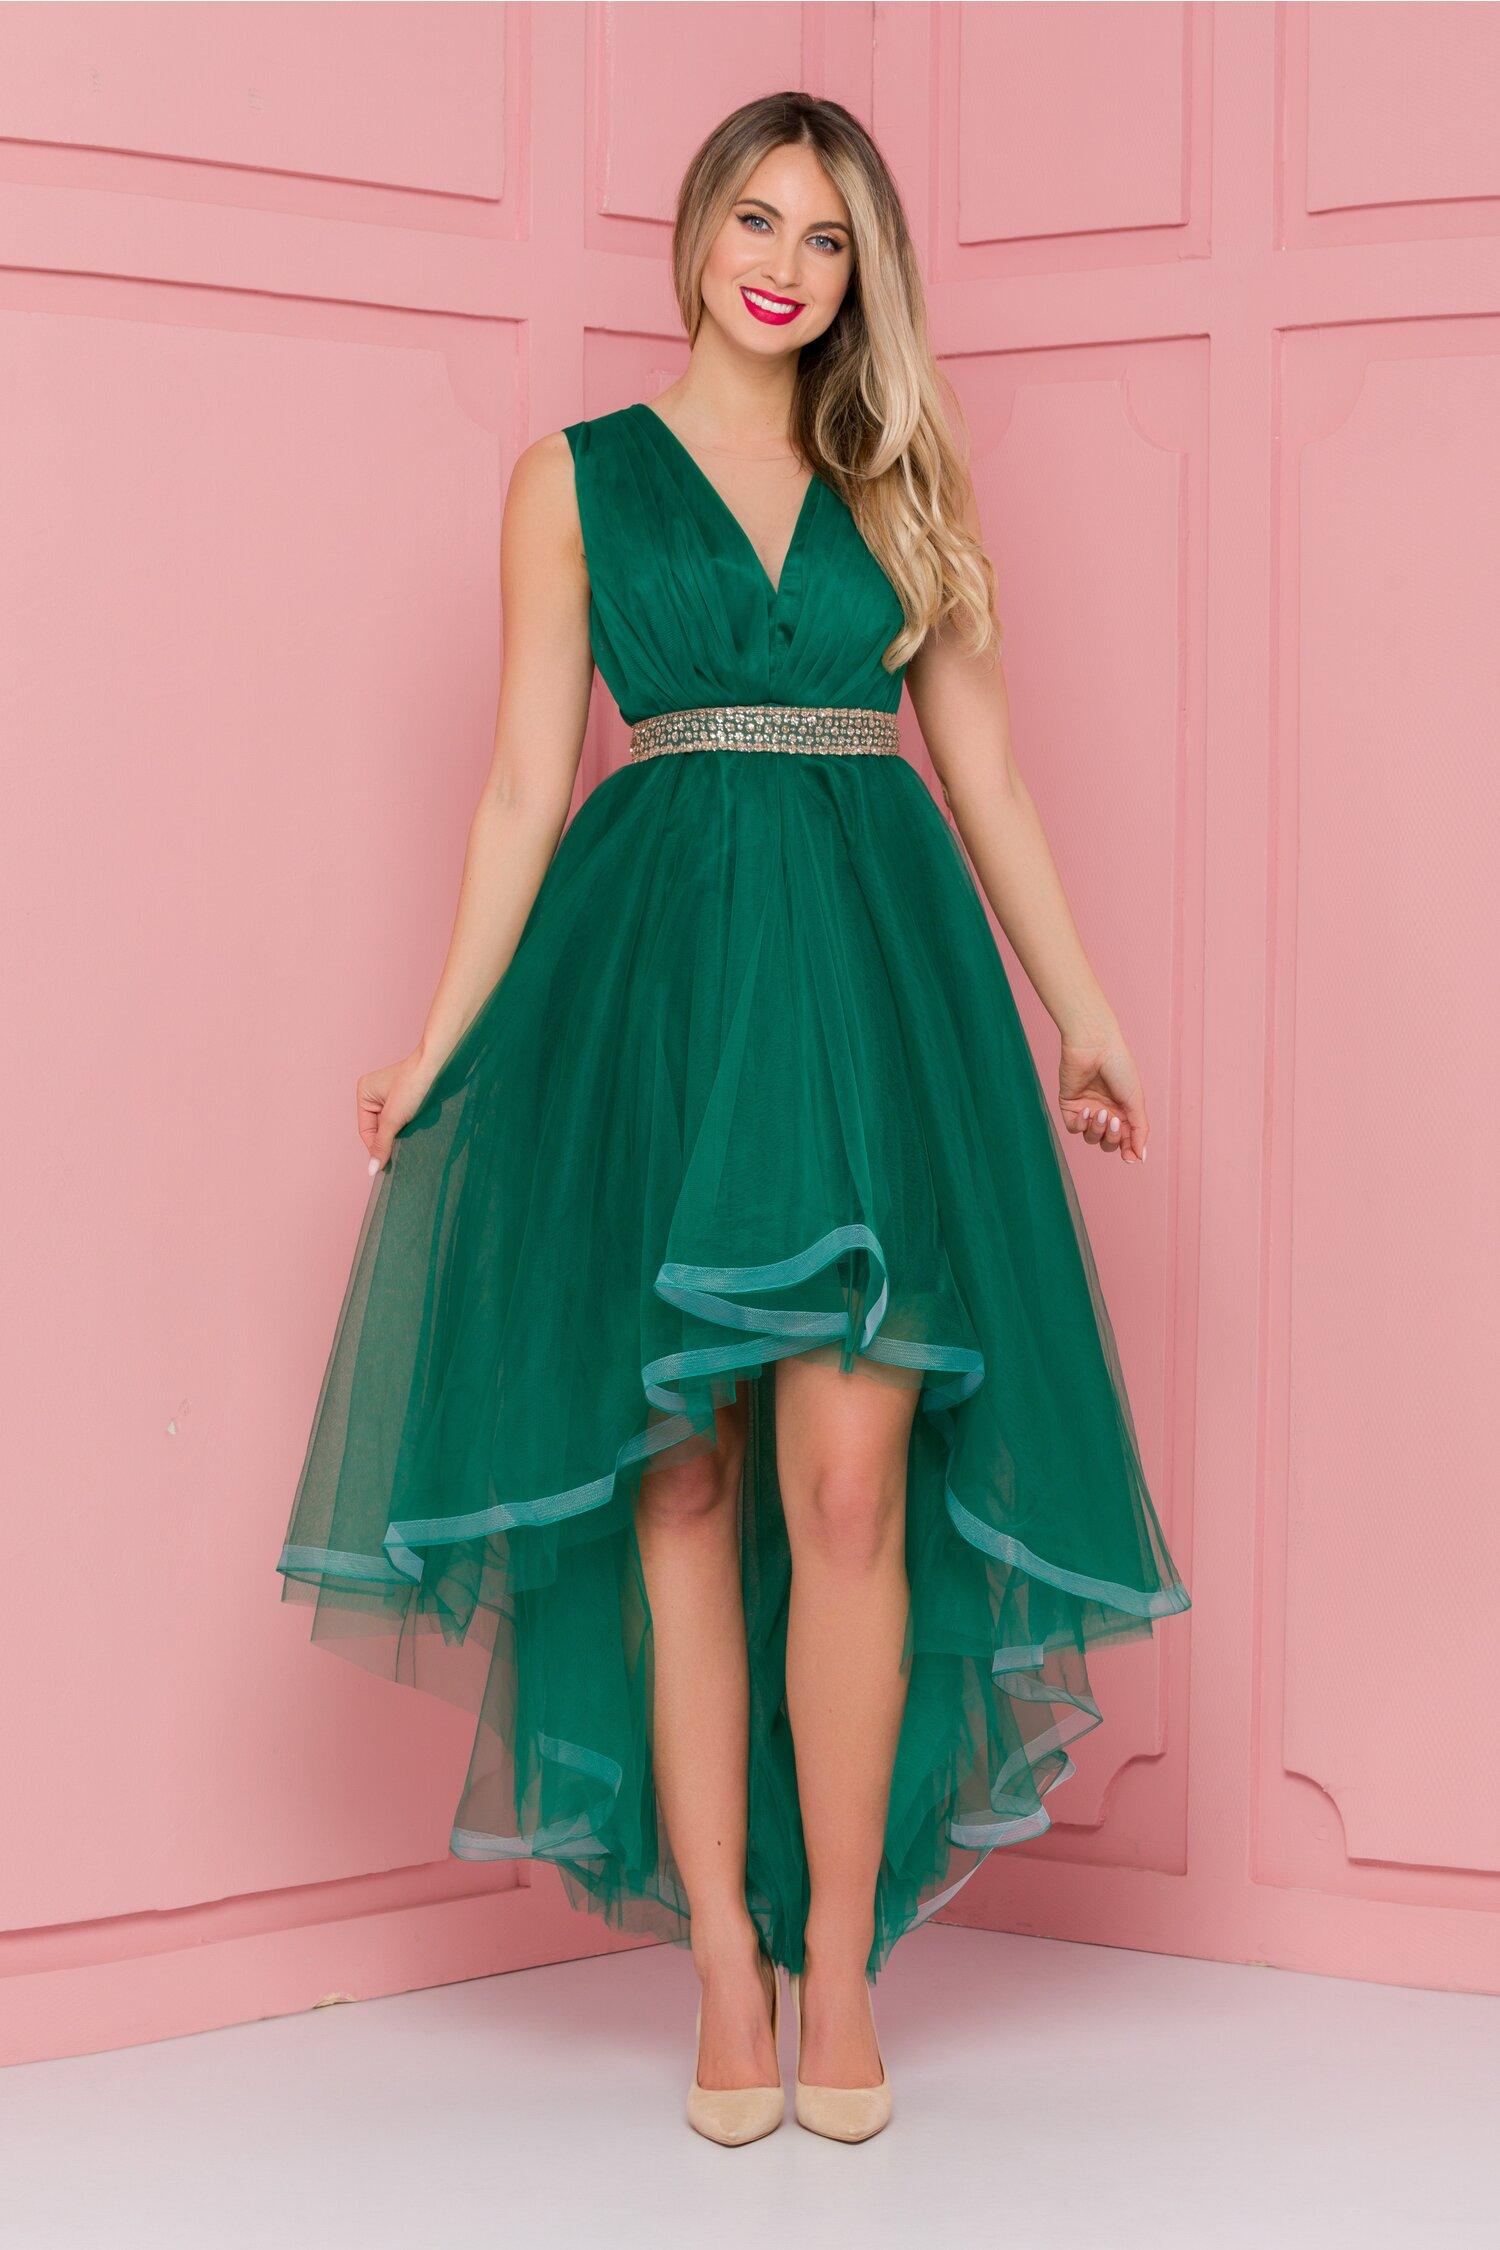 Rochie Isabel verde din tull cu pliuri la bust si cordon in talie